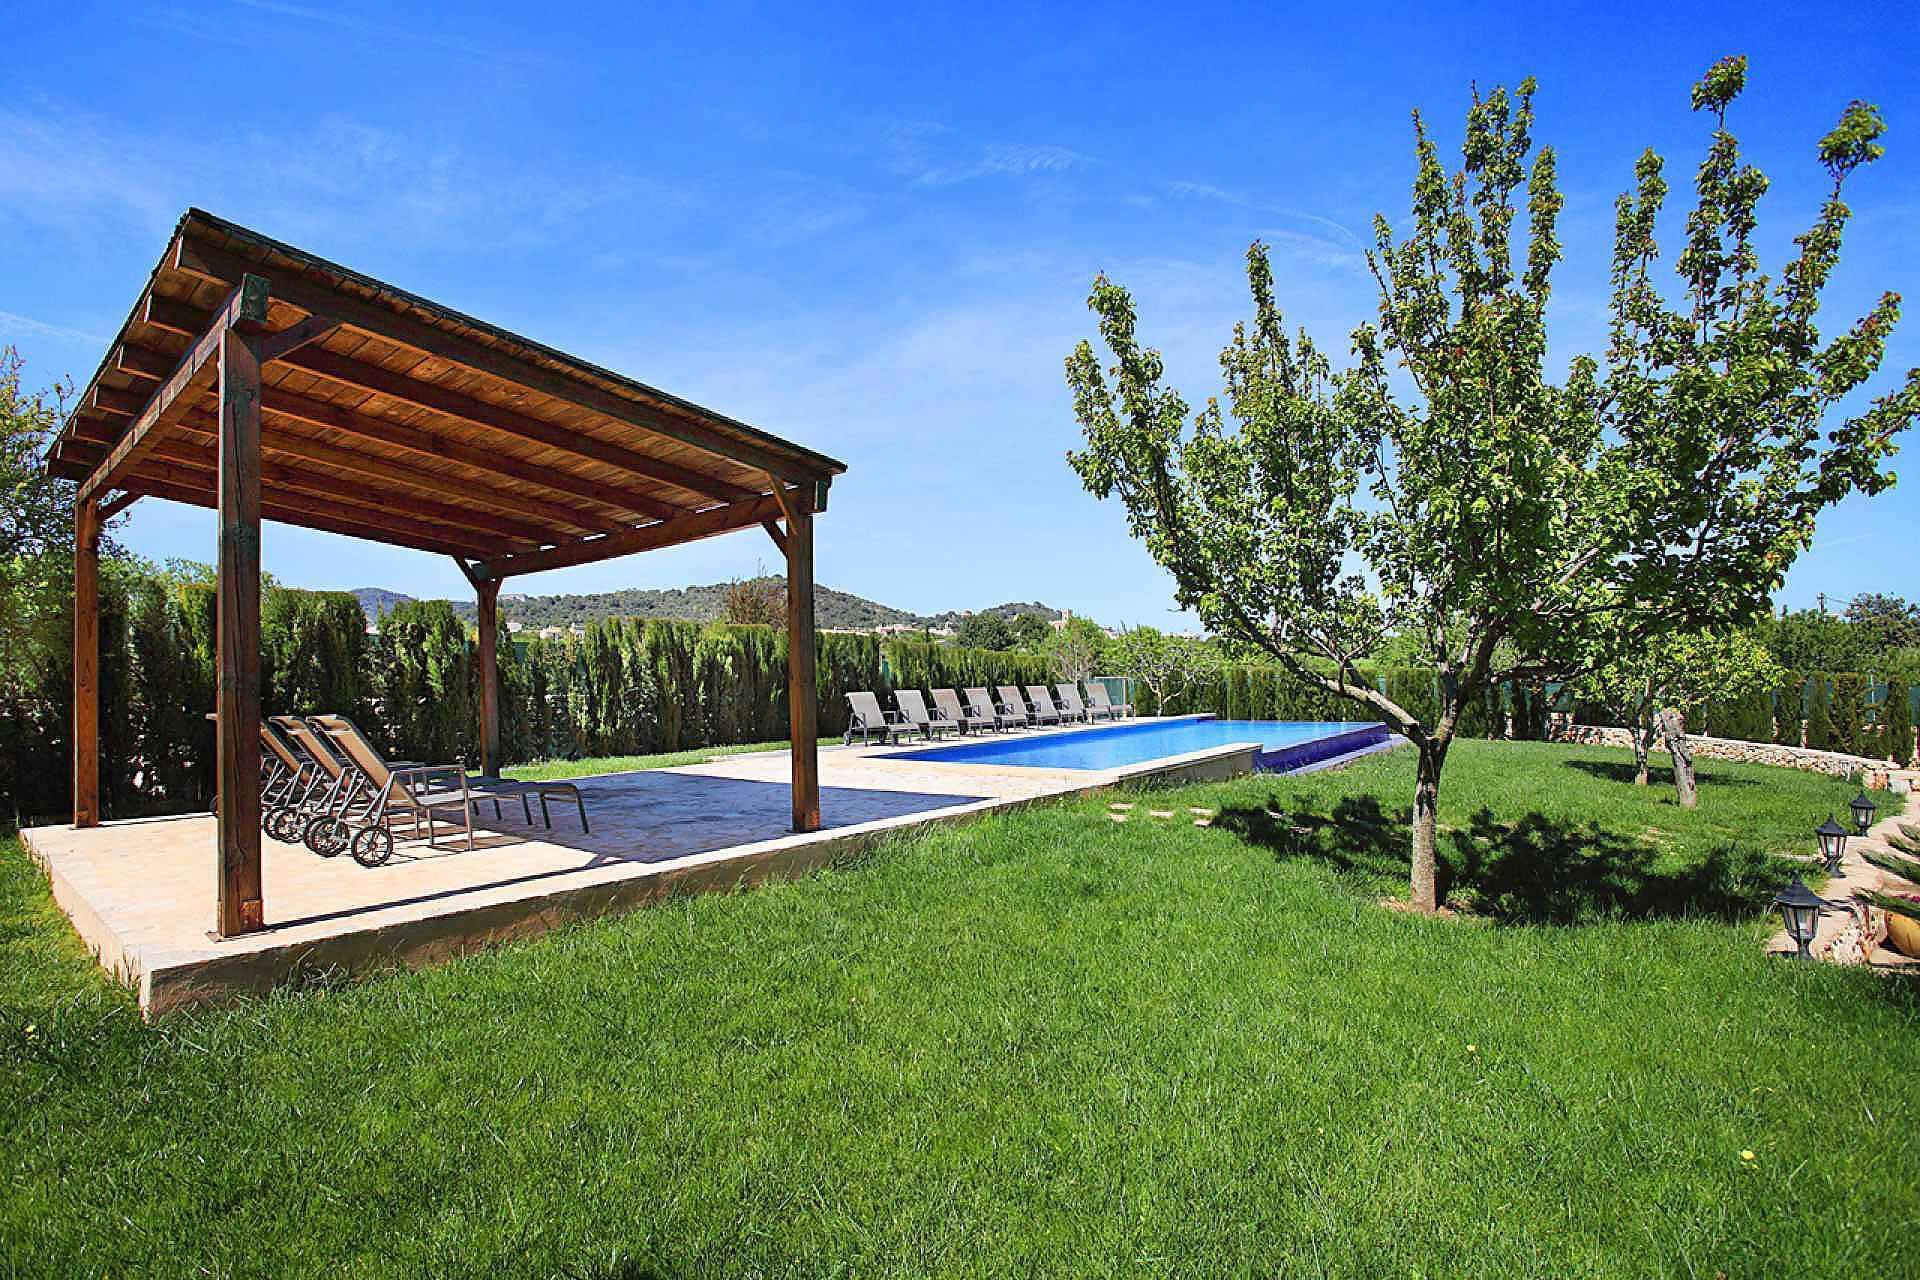 01-33 Spacious holiday home Mallorca East Bild 5